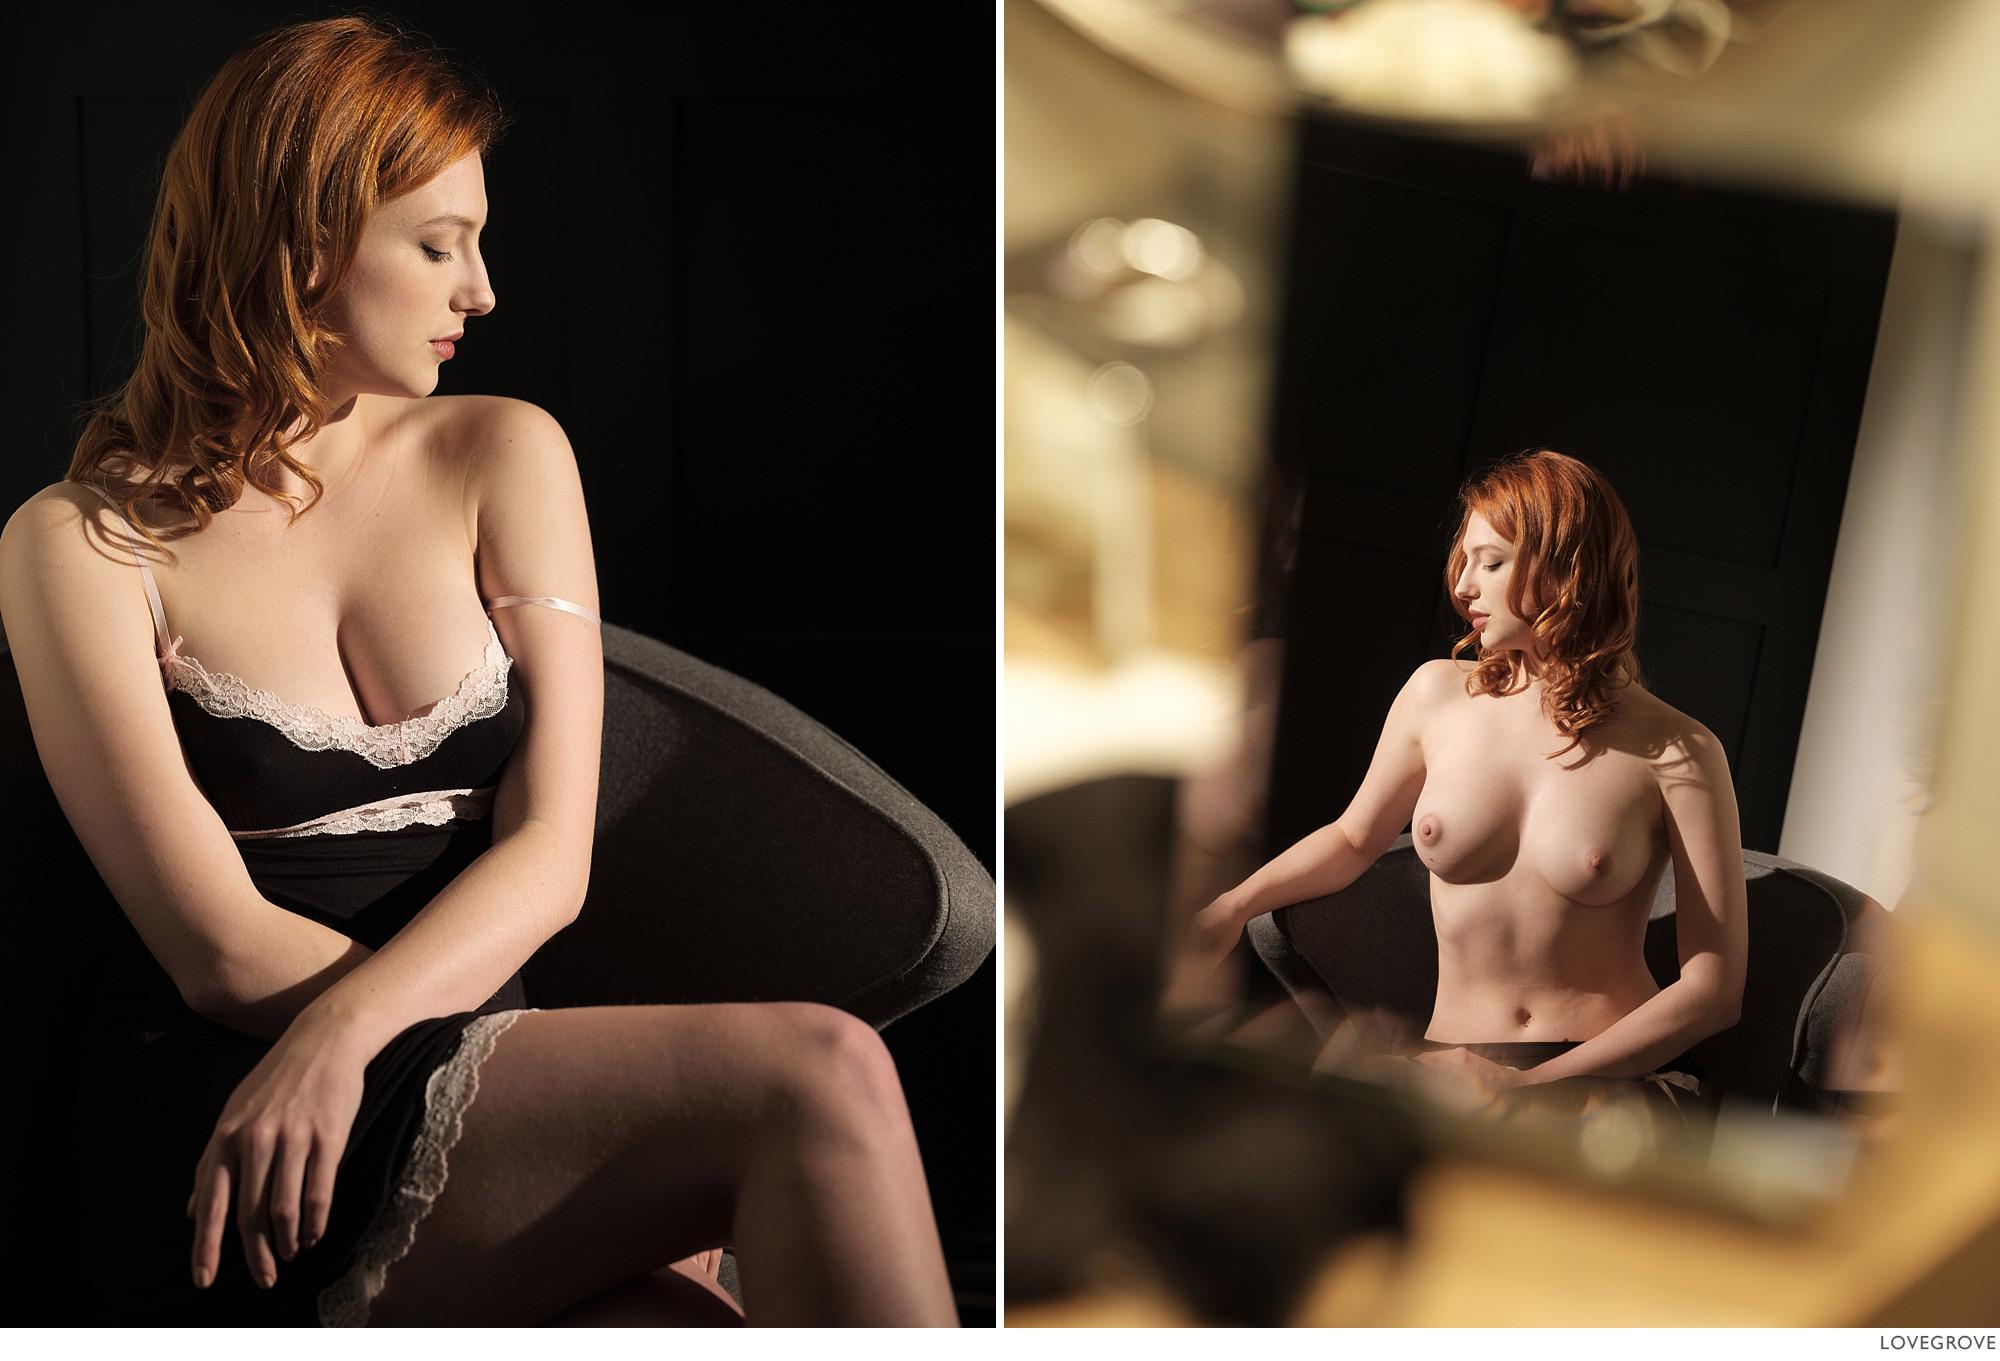 Claire Rammelkamp nude in the mirror